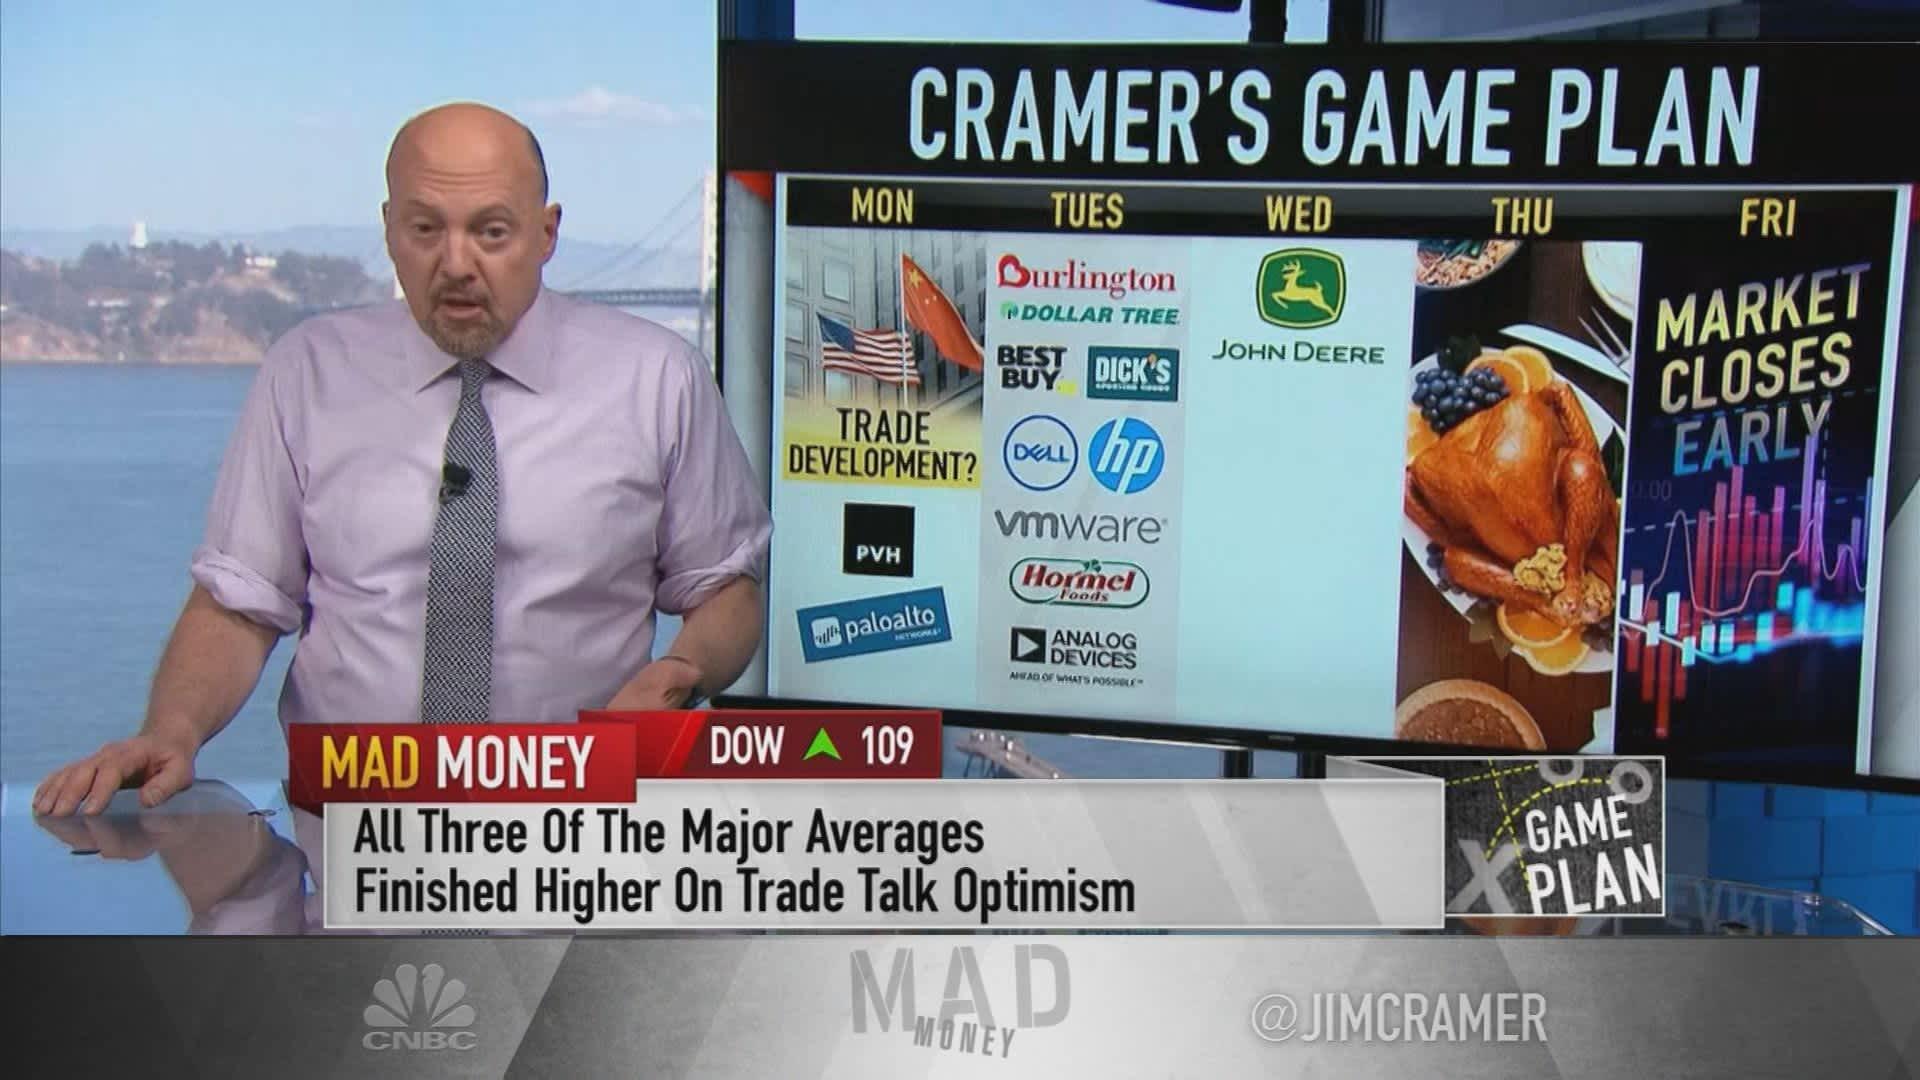 Cramer's week ahead: Short week on Wall Street, plate full